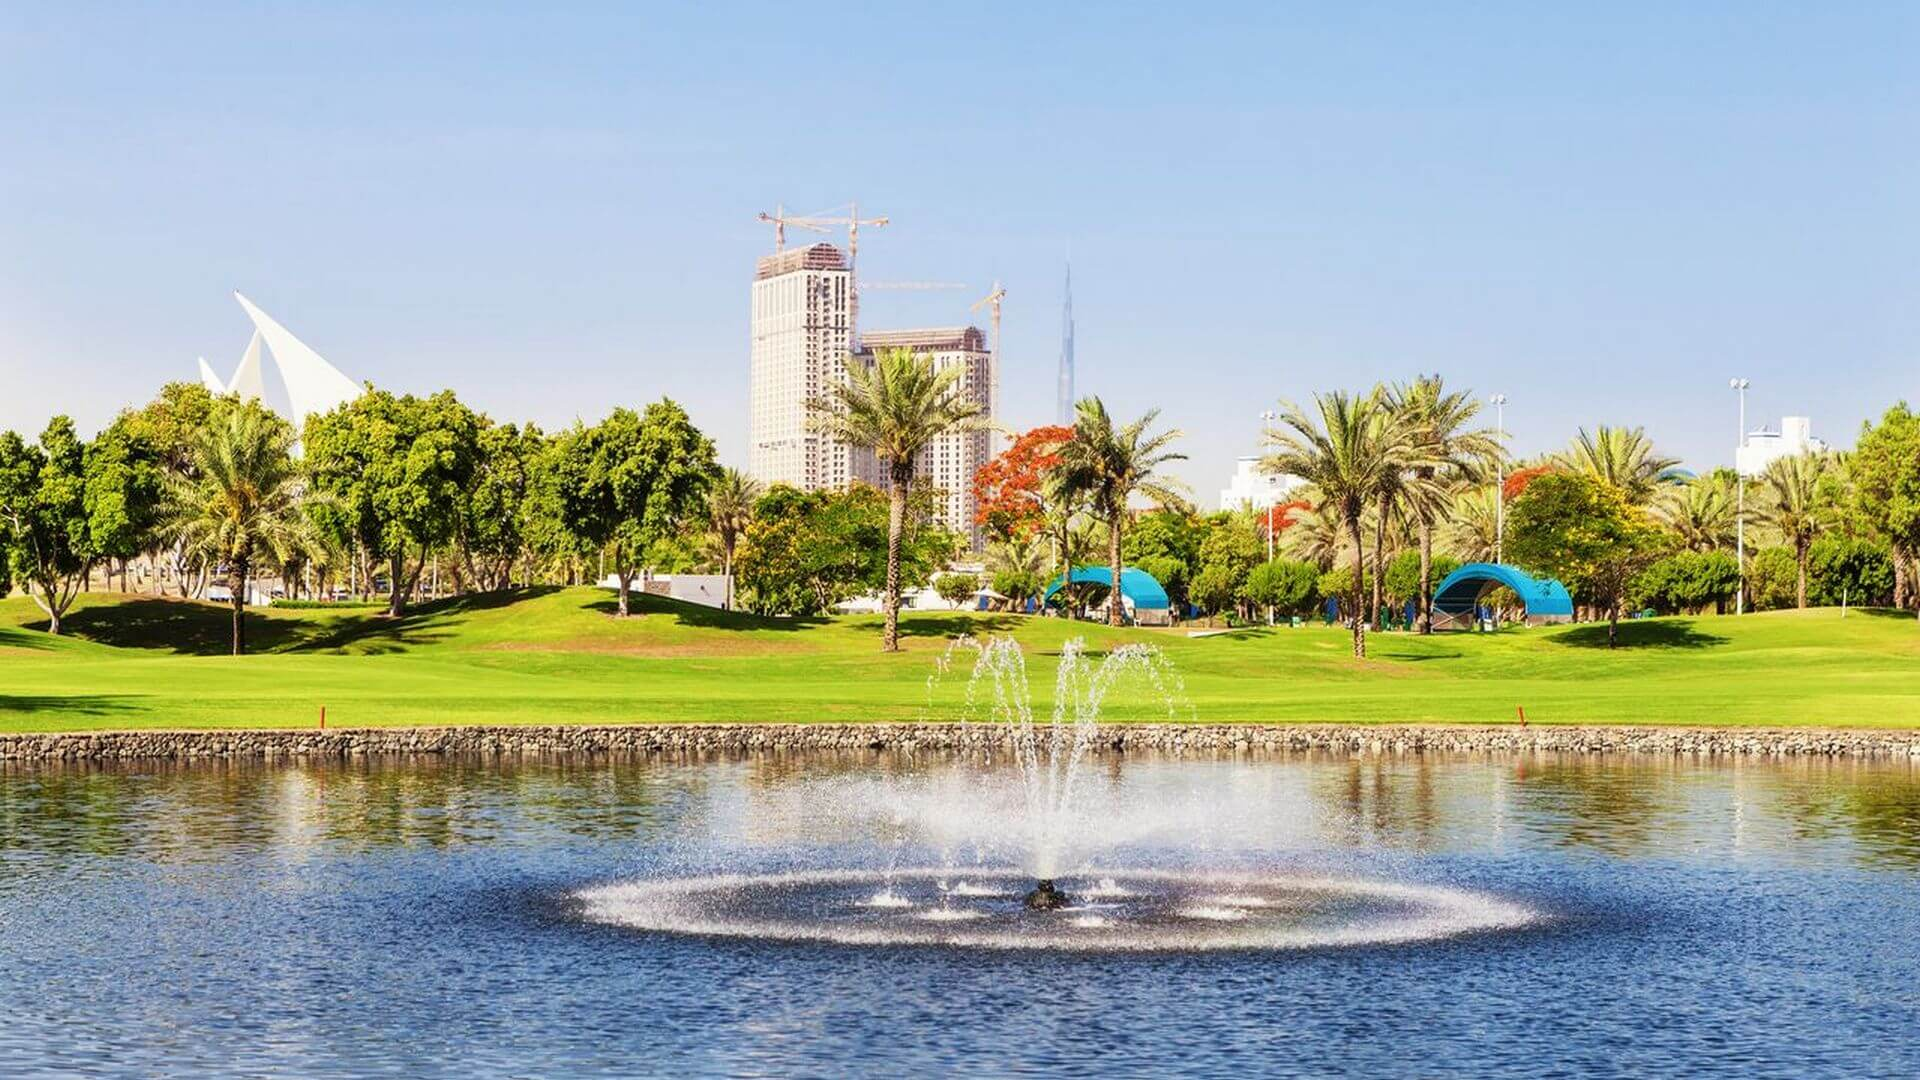 Ciudad Deportiva de Dubai - 13